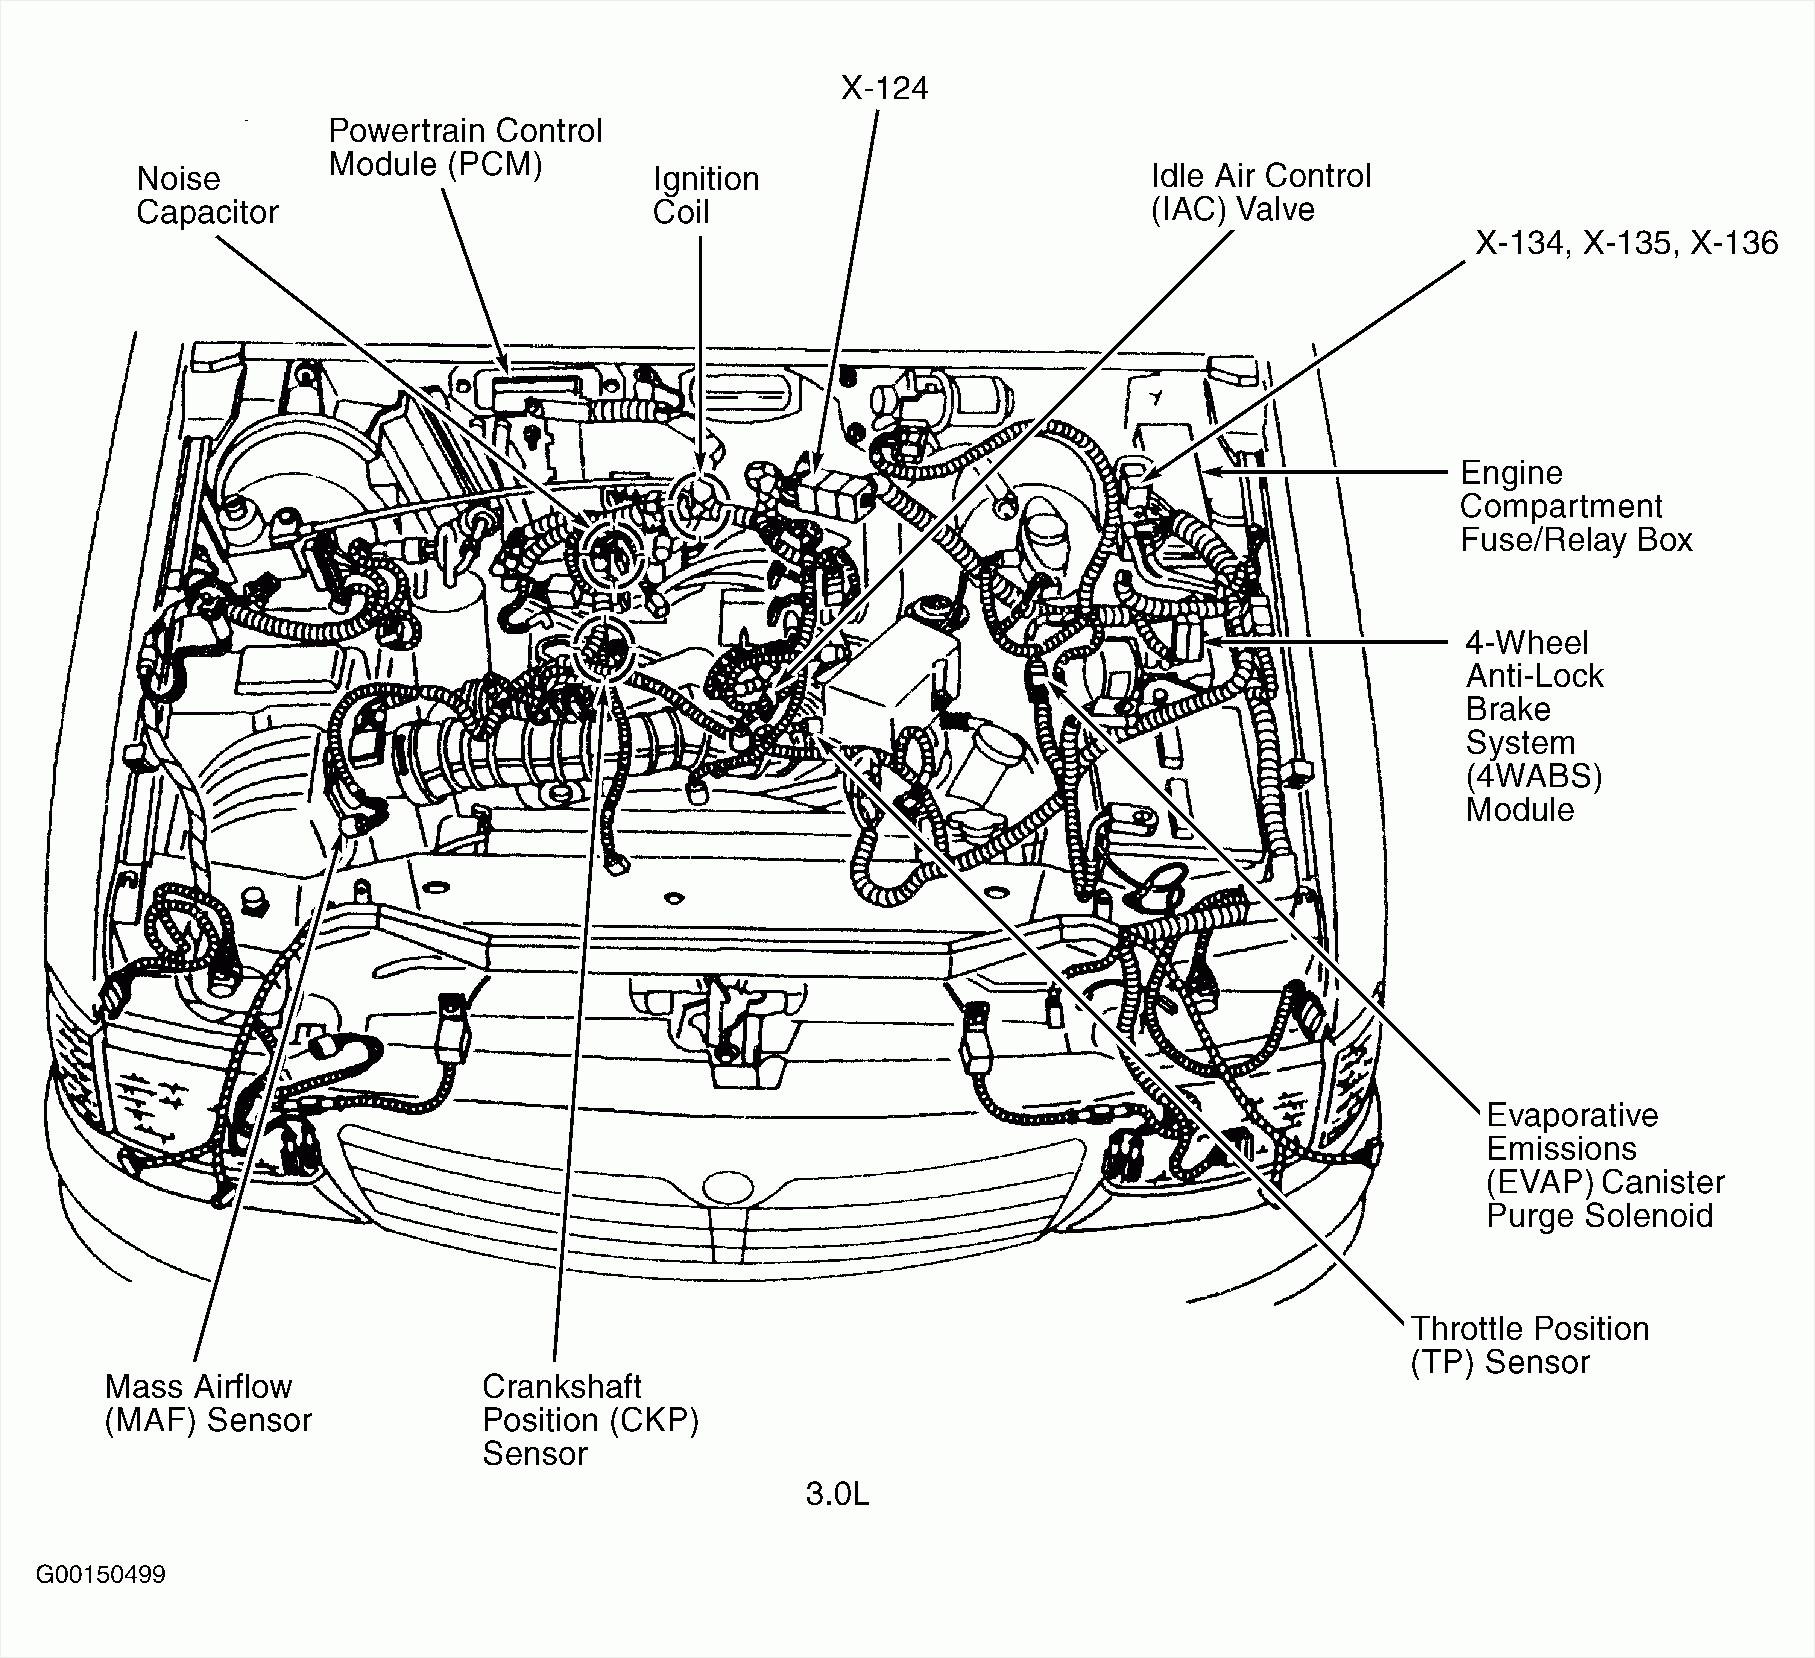 1996 mazda 626 engine diagram 13 xaz capecoral bootsvermietung de u2022 rh 13 xaz capecoral bootsvermietung de